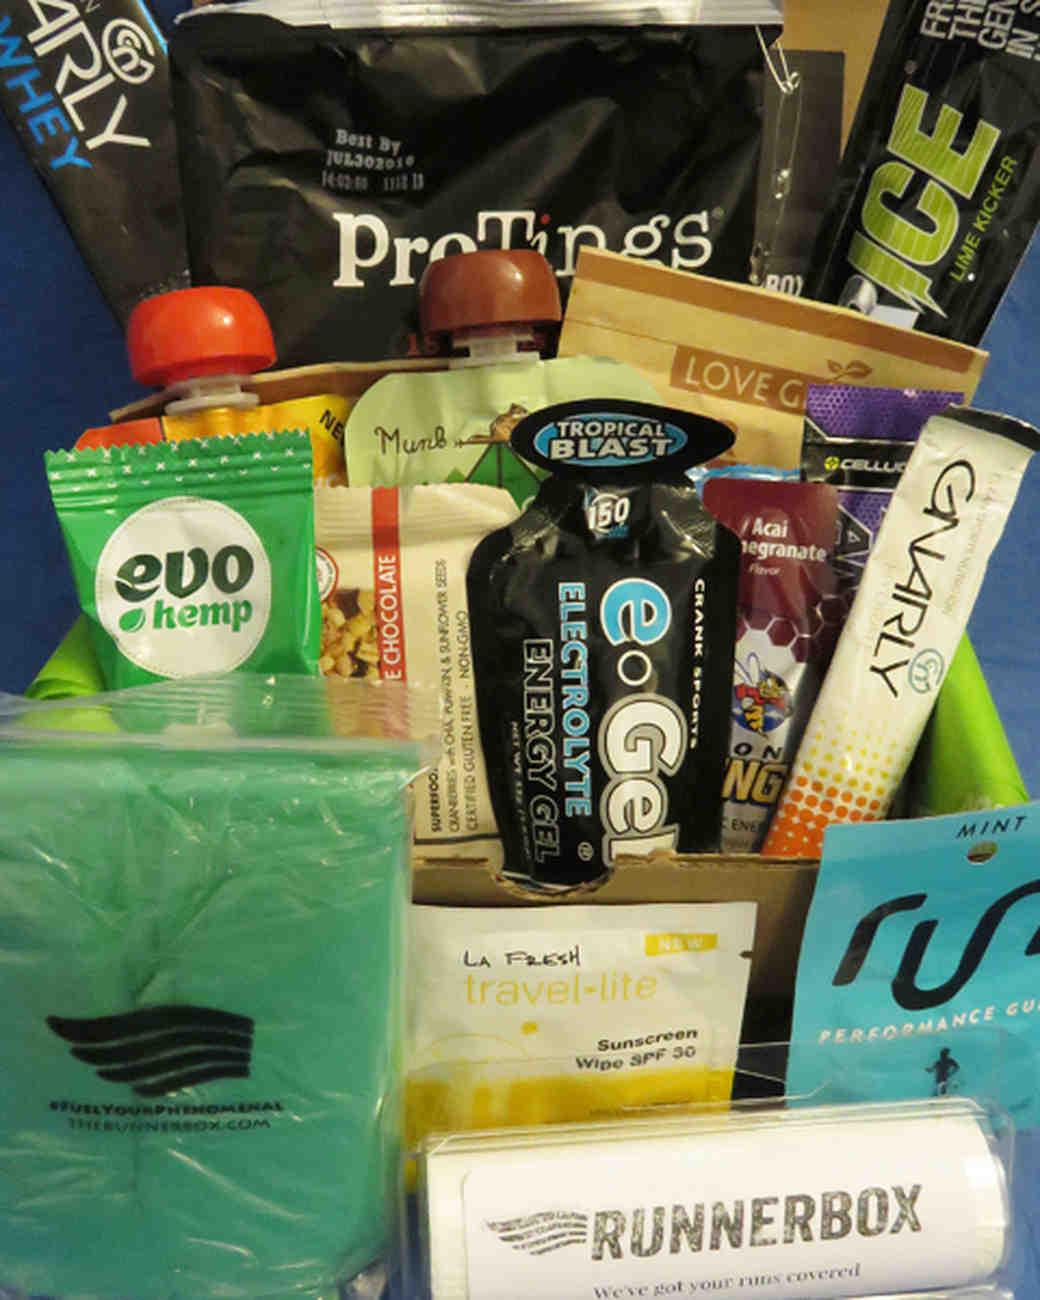 subscription-services-gift-runner-box-0516.jpg